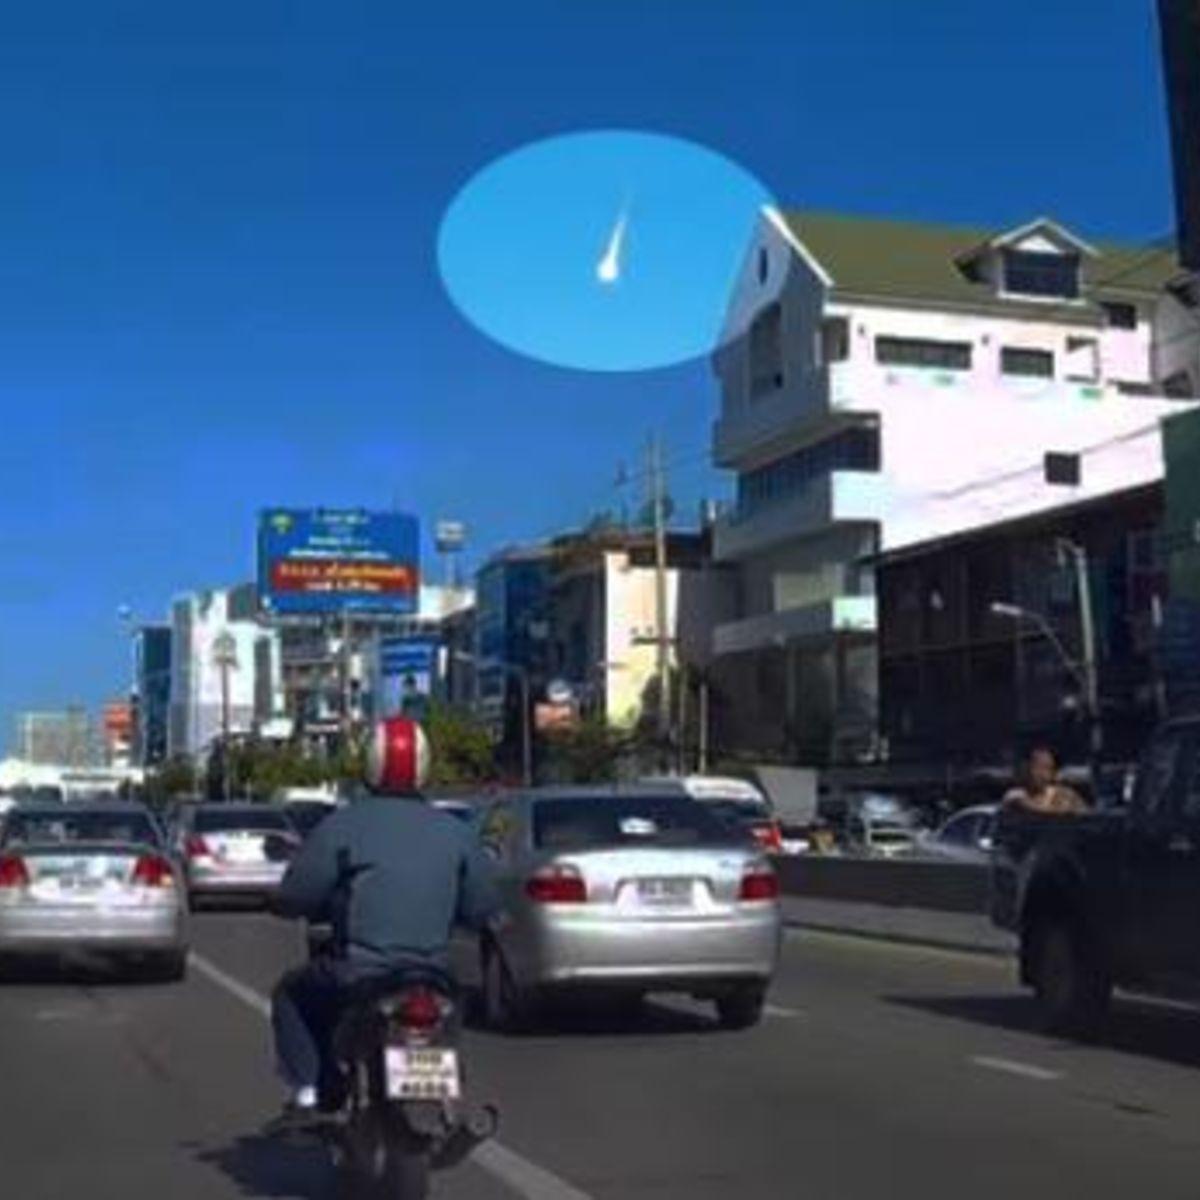 bangkok_fireball_sep062015.jpg.CROP.rectangle-large_0.jpg